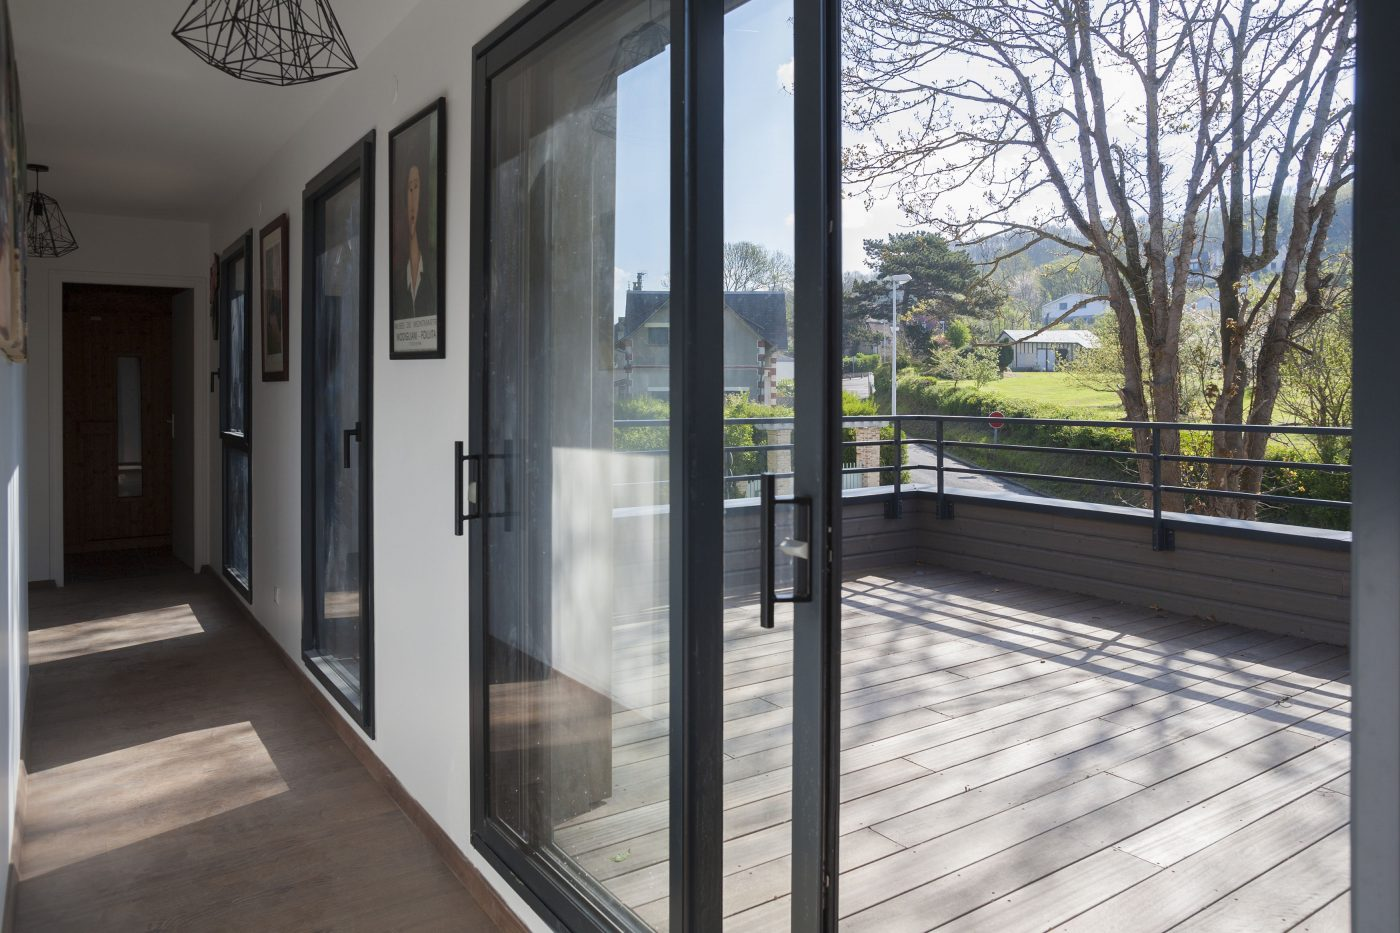 Philippe_Zerbib_Architecte_construction_maisons_ossature_bois_projet_maison_benhamou_MG_8464